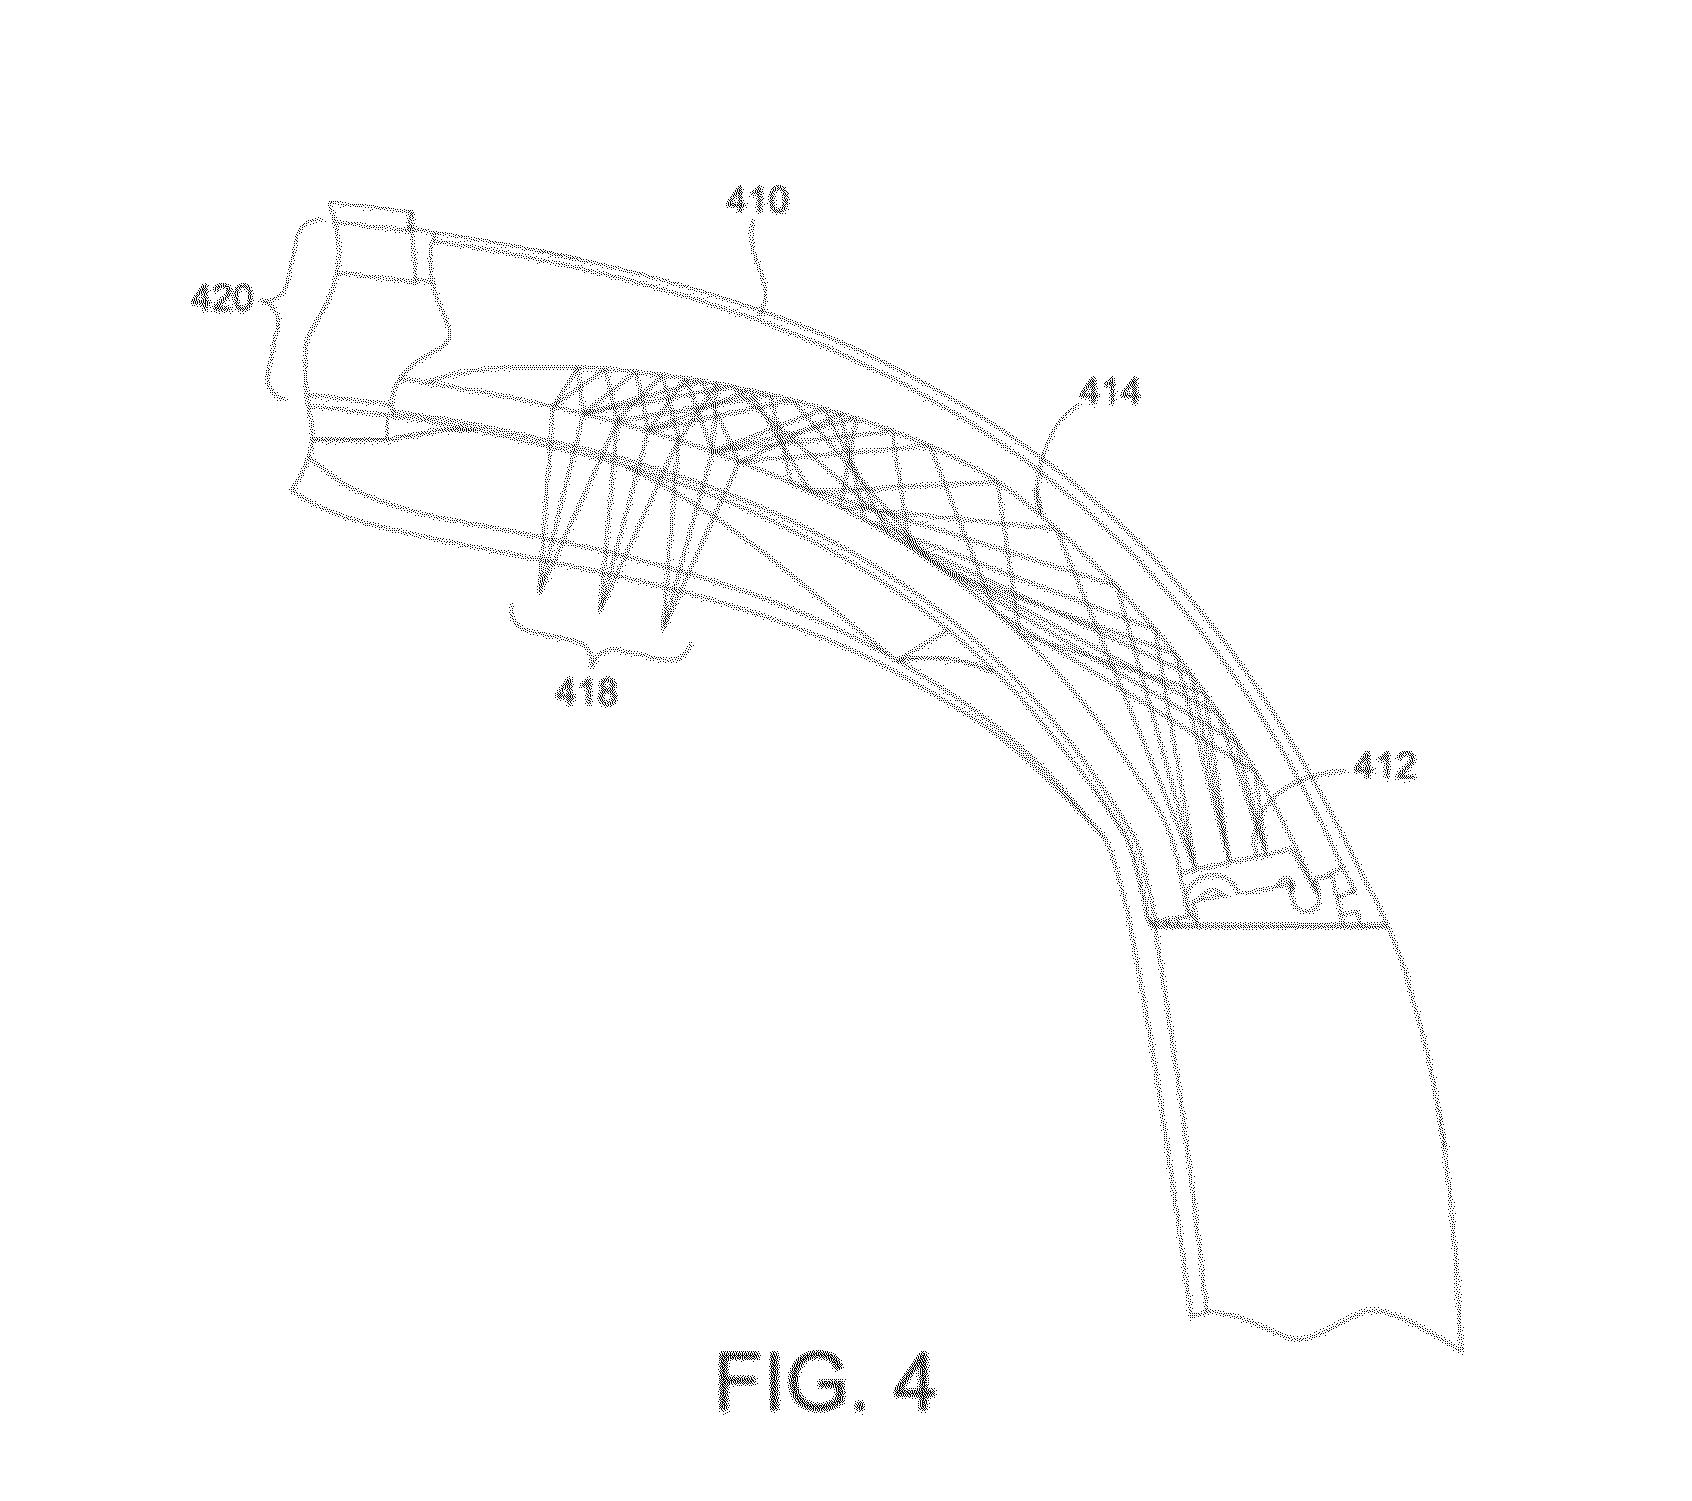 Patent US 8,488,246 B2